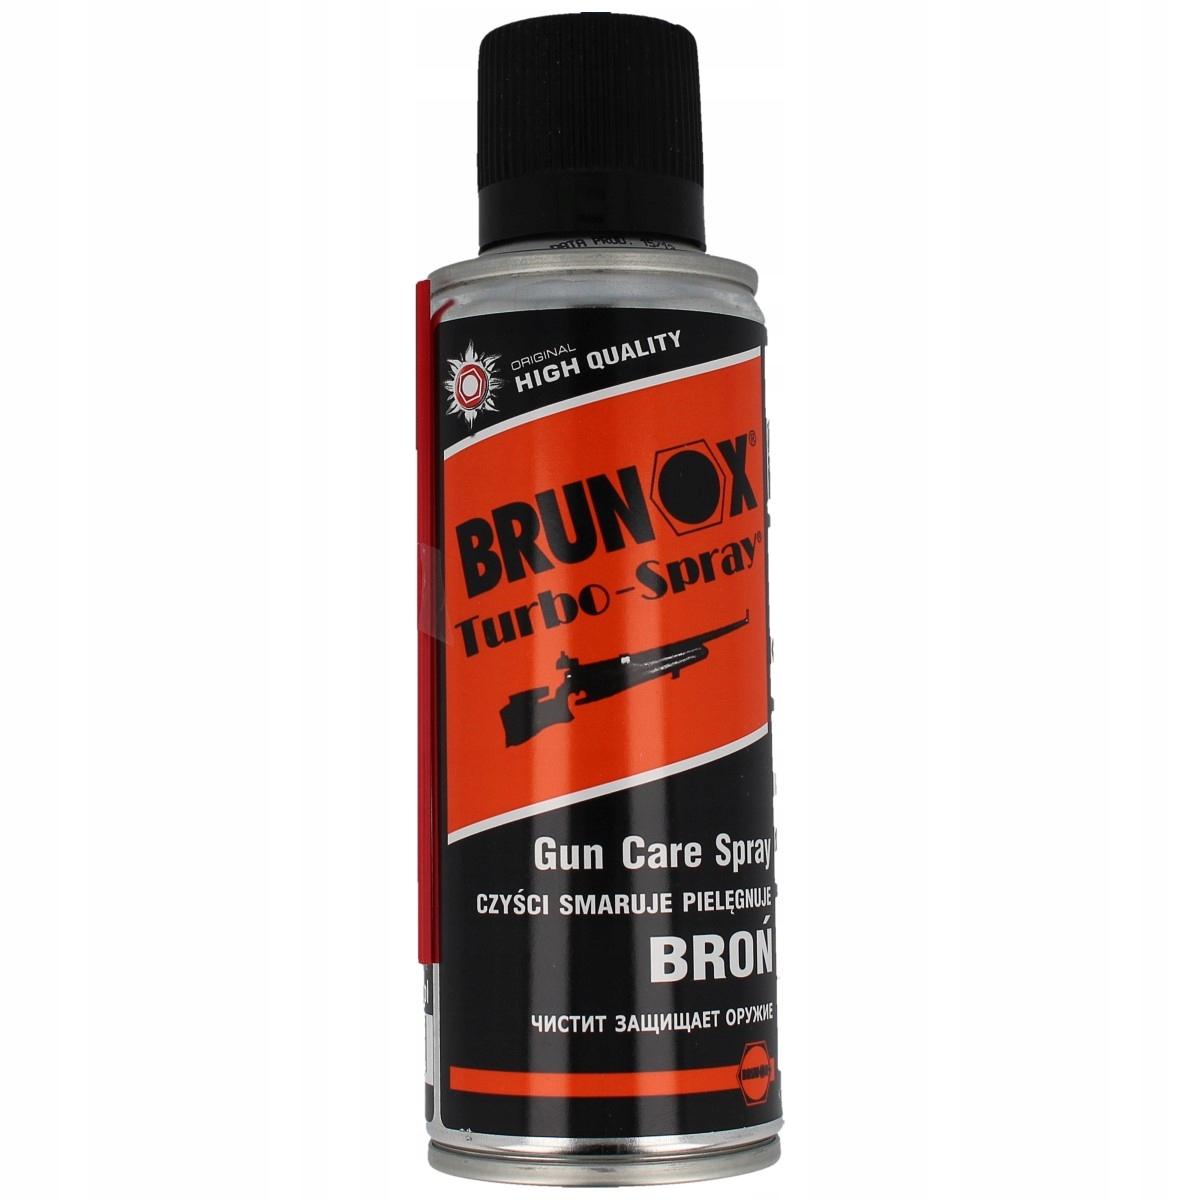 Olej Brunox (GUN CARE SPRAY 200ml)